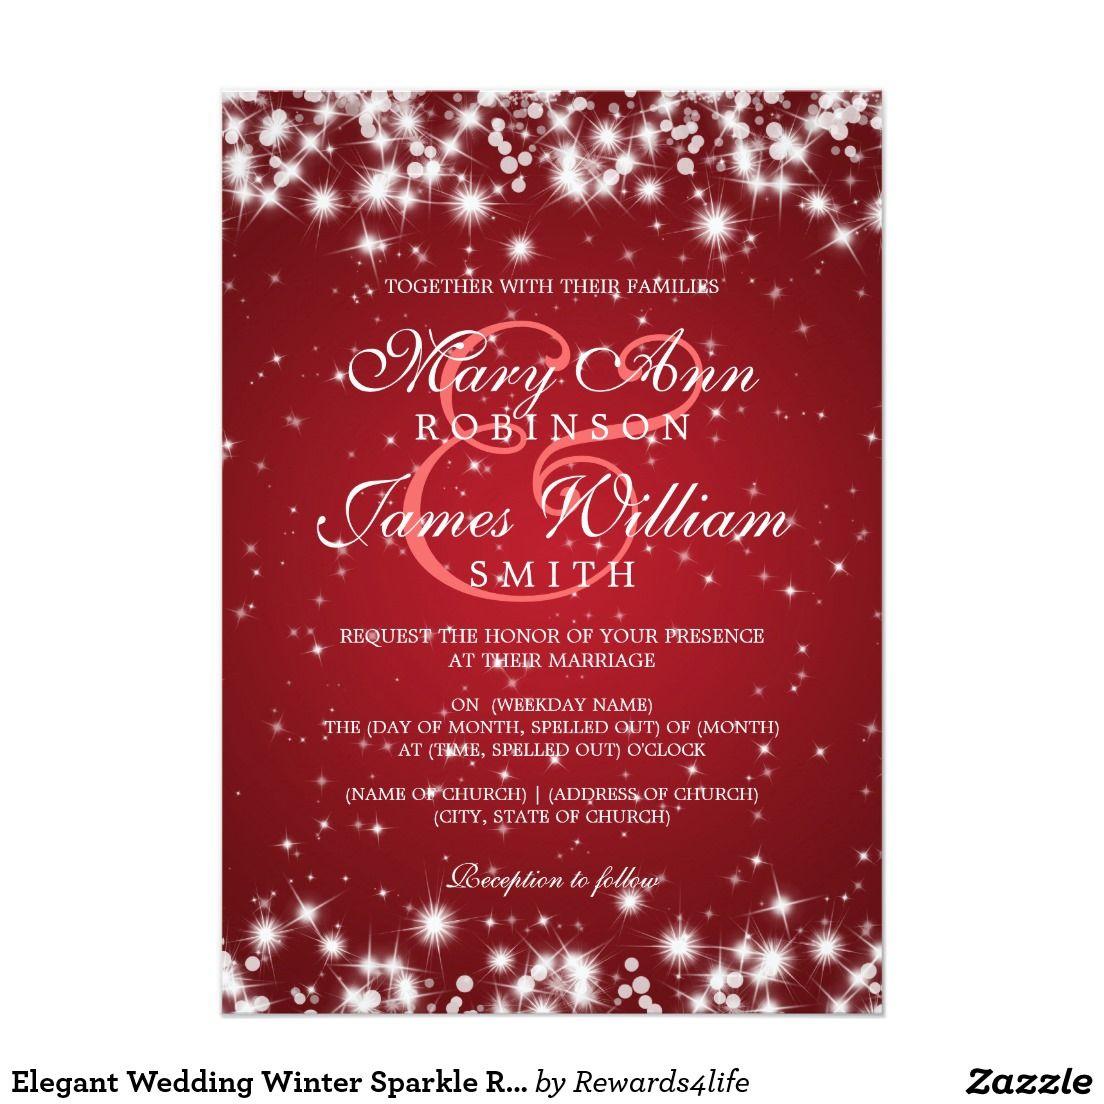 Elegant Wedding Winter Sparkle Red Card | Perfect Weddings ...